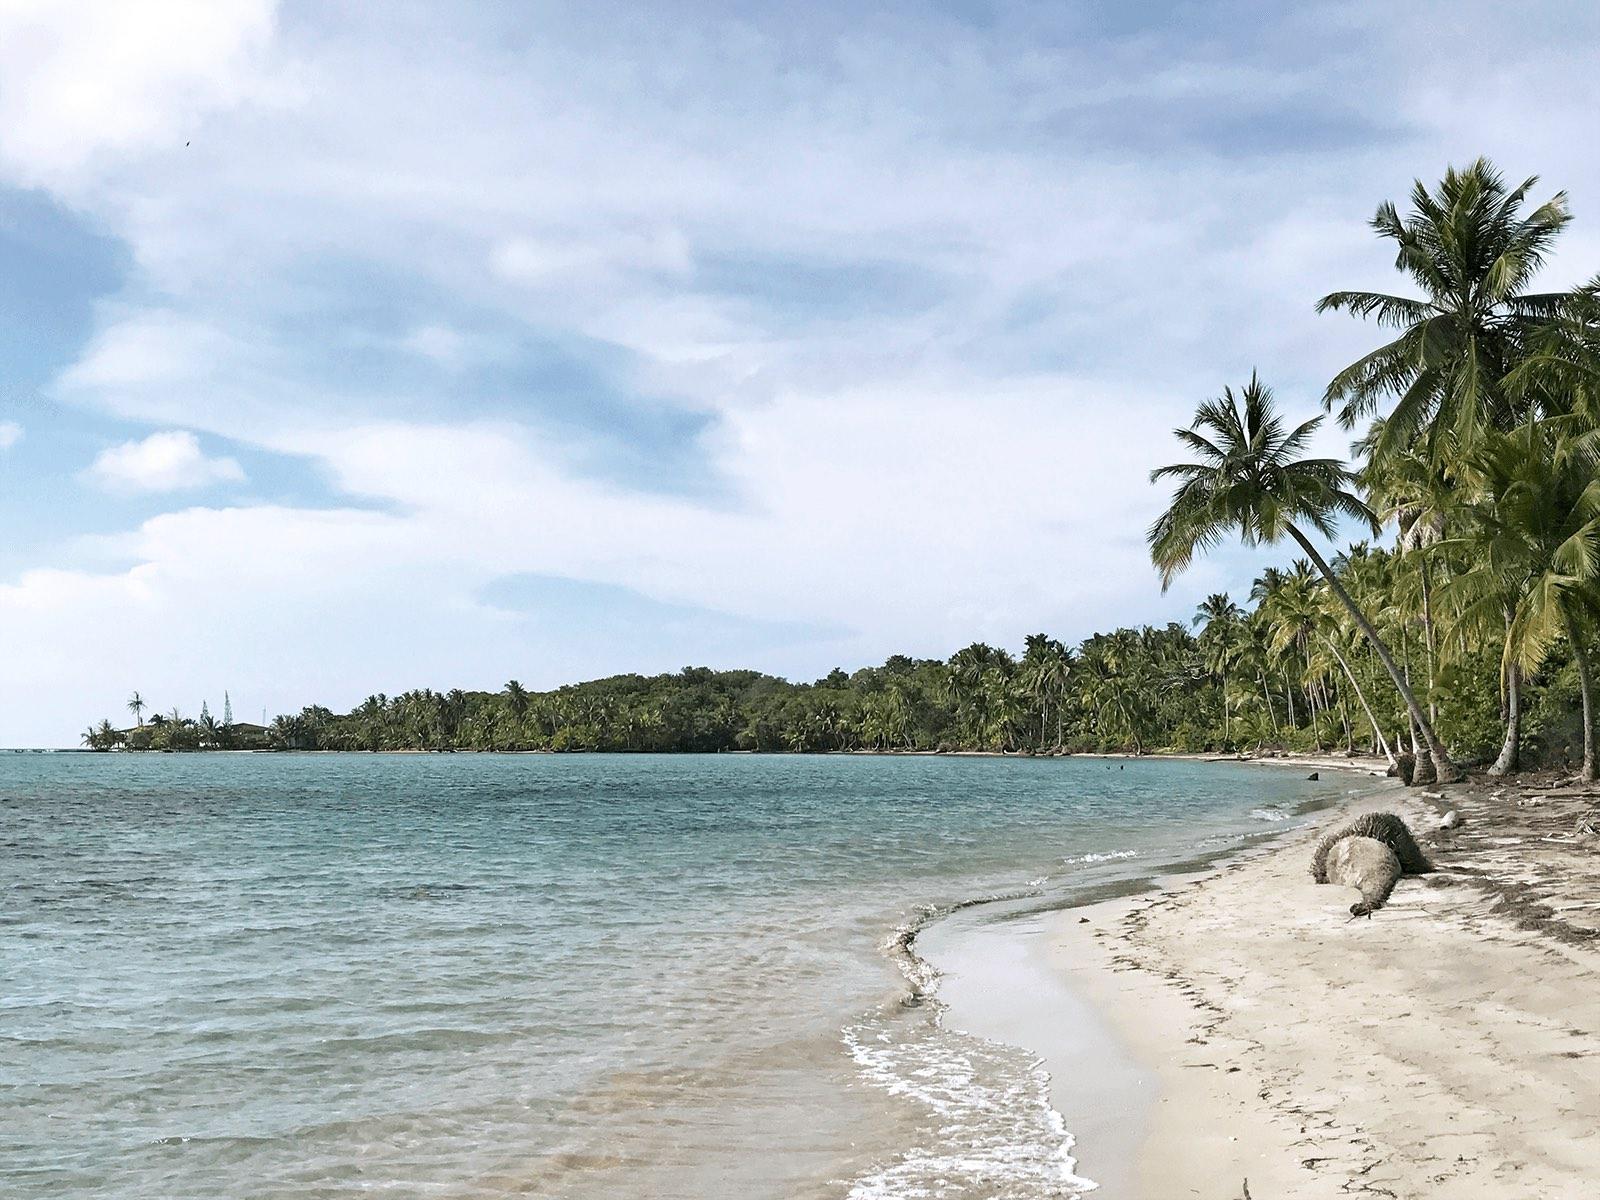 Starfish beach or Playa Estrella in Bocas del Toro, Panama